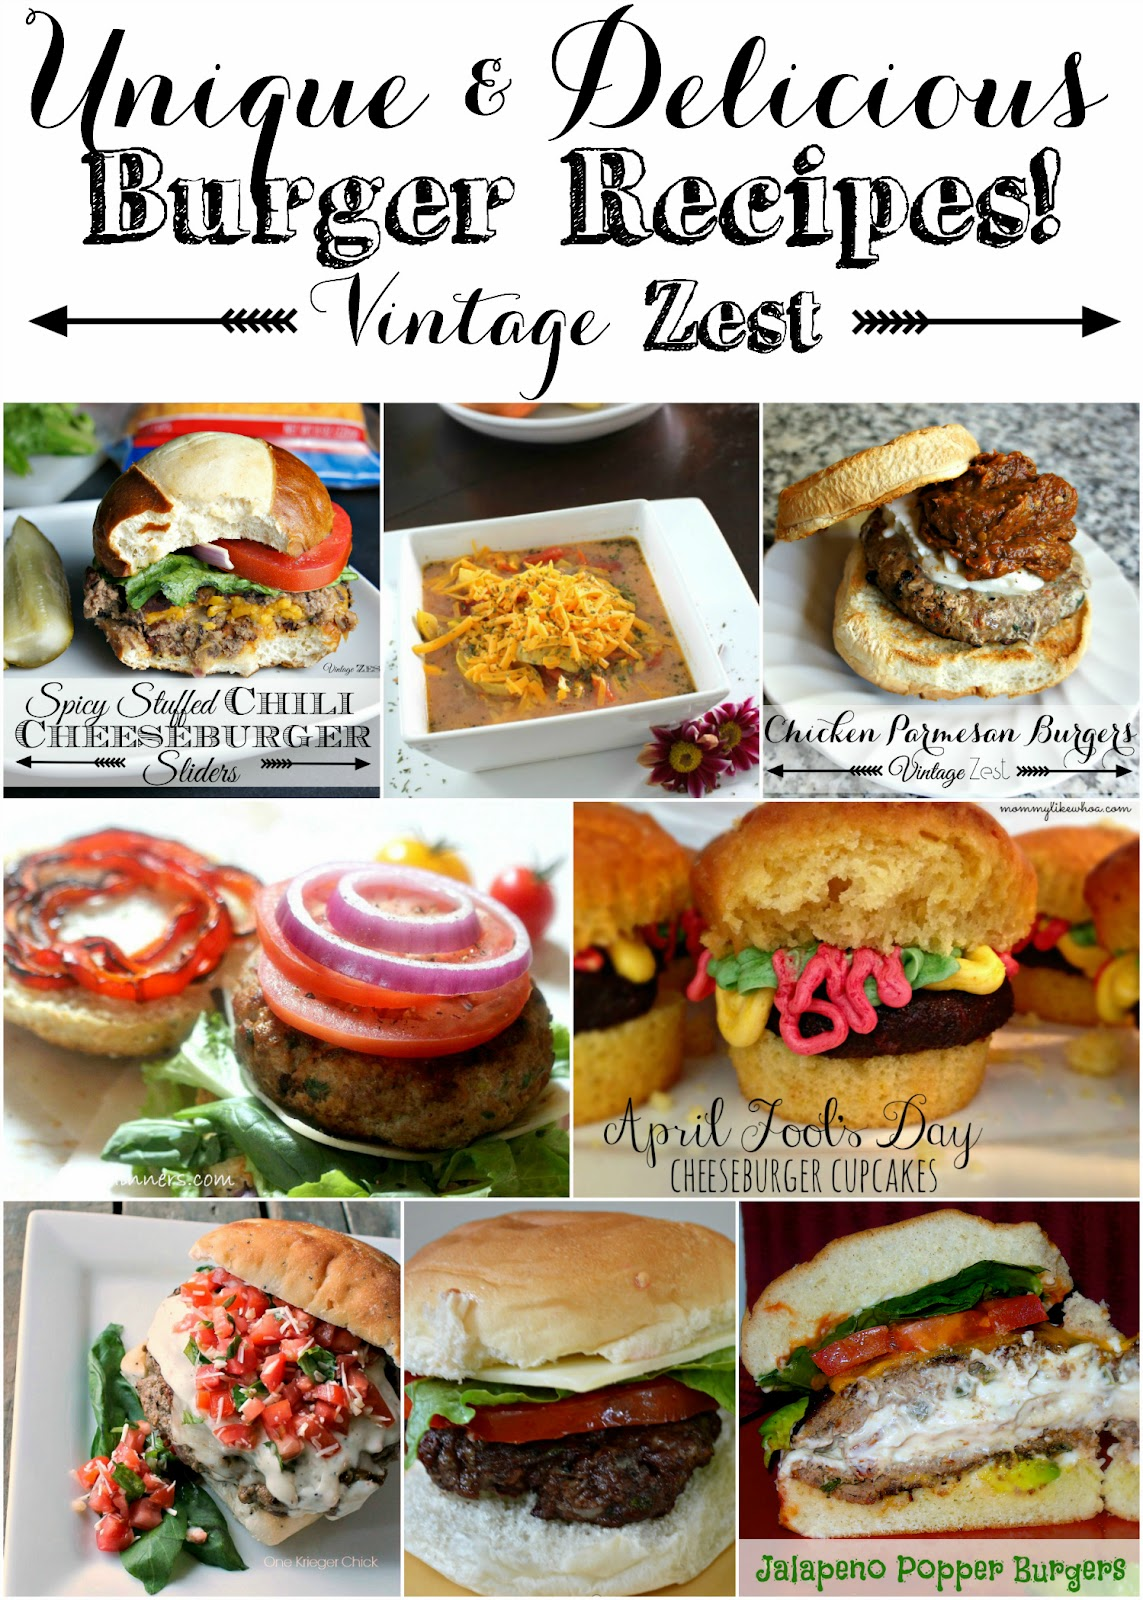 Unique and Delicious Burger Recipes!